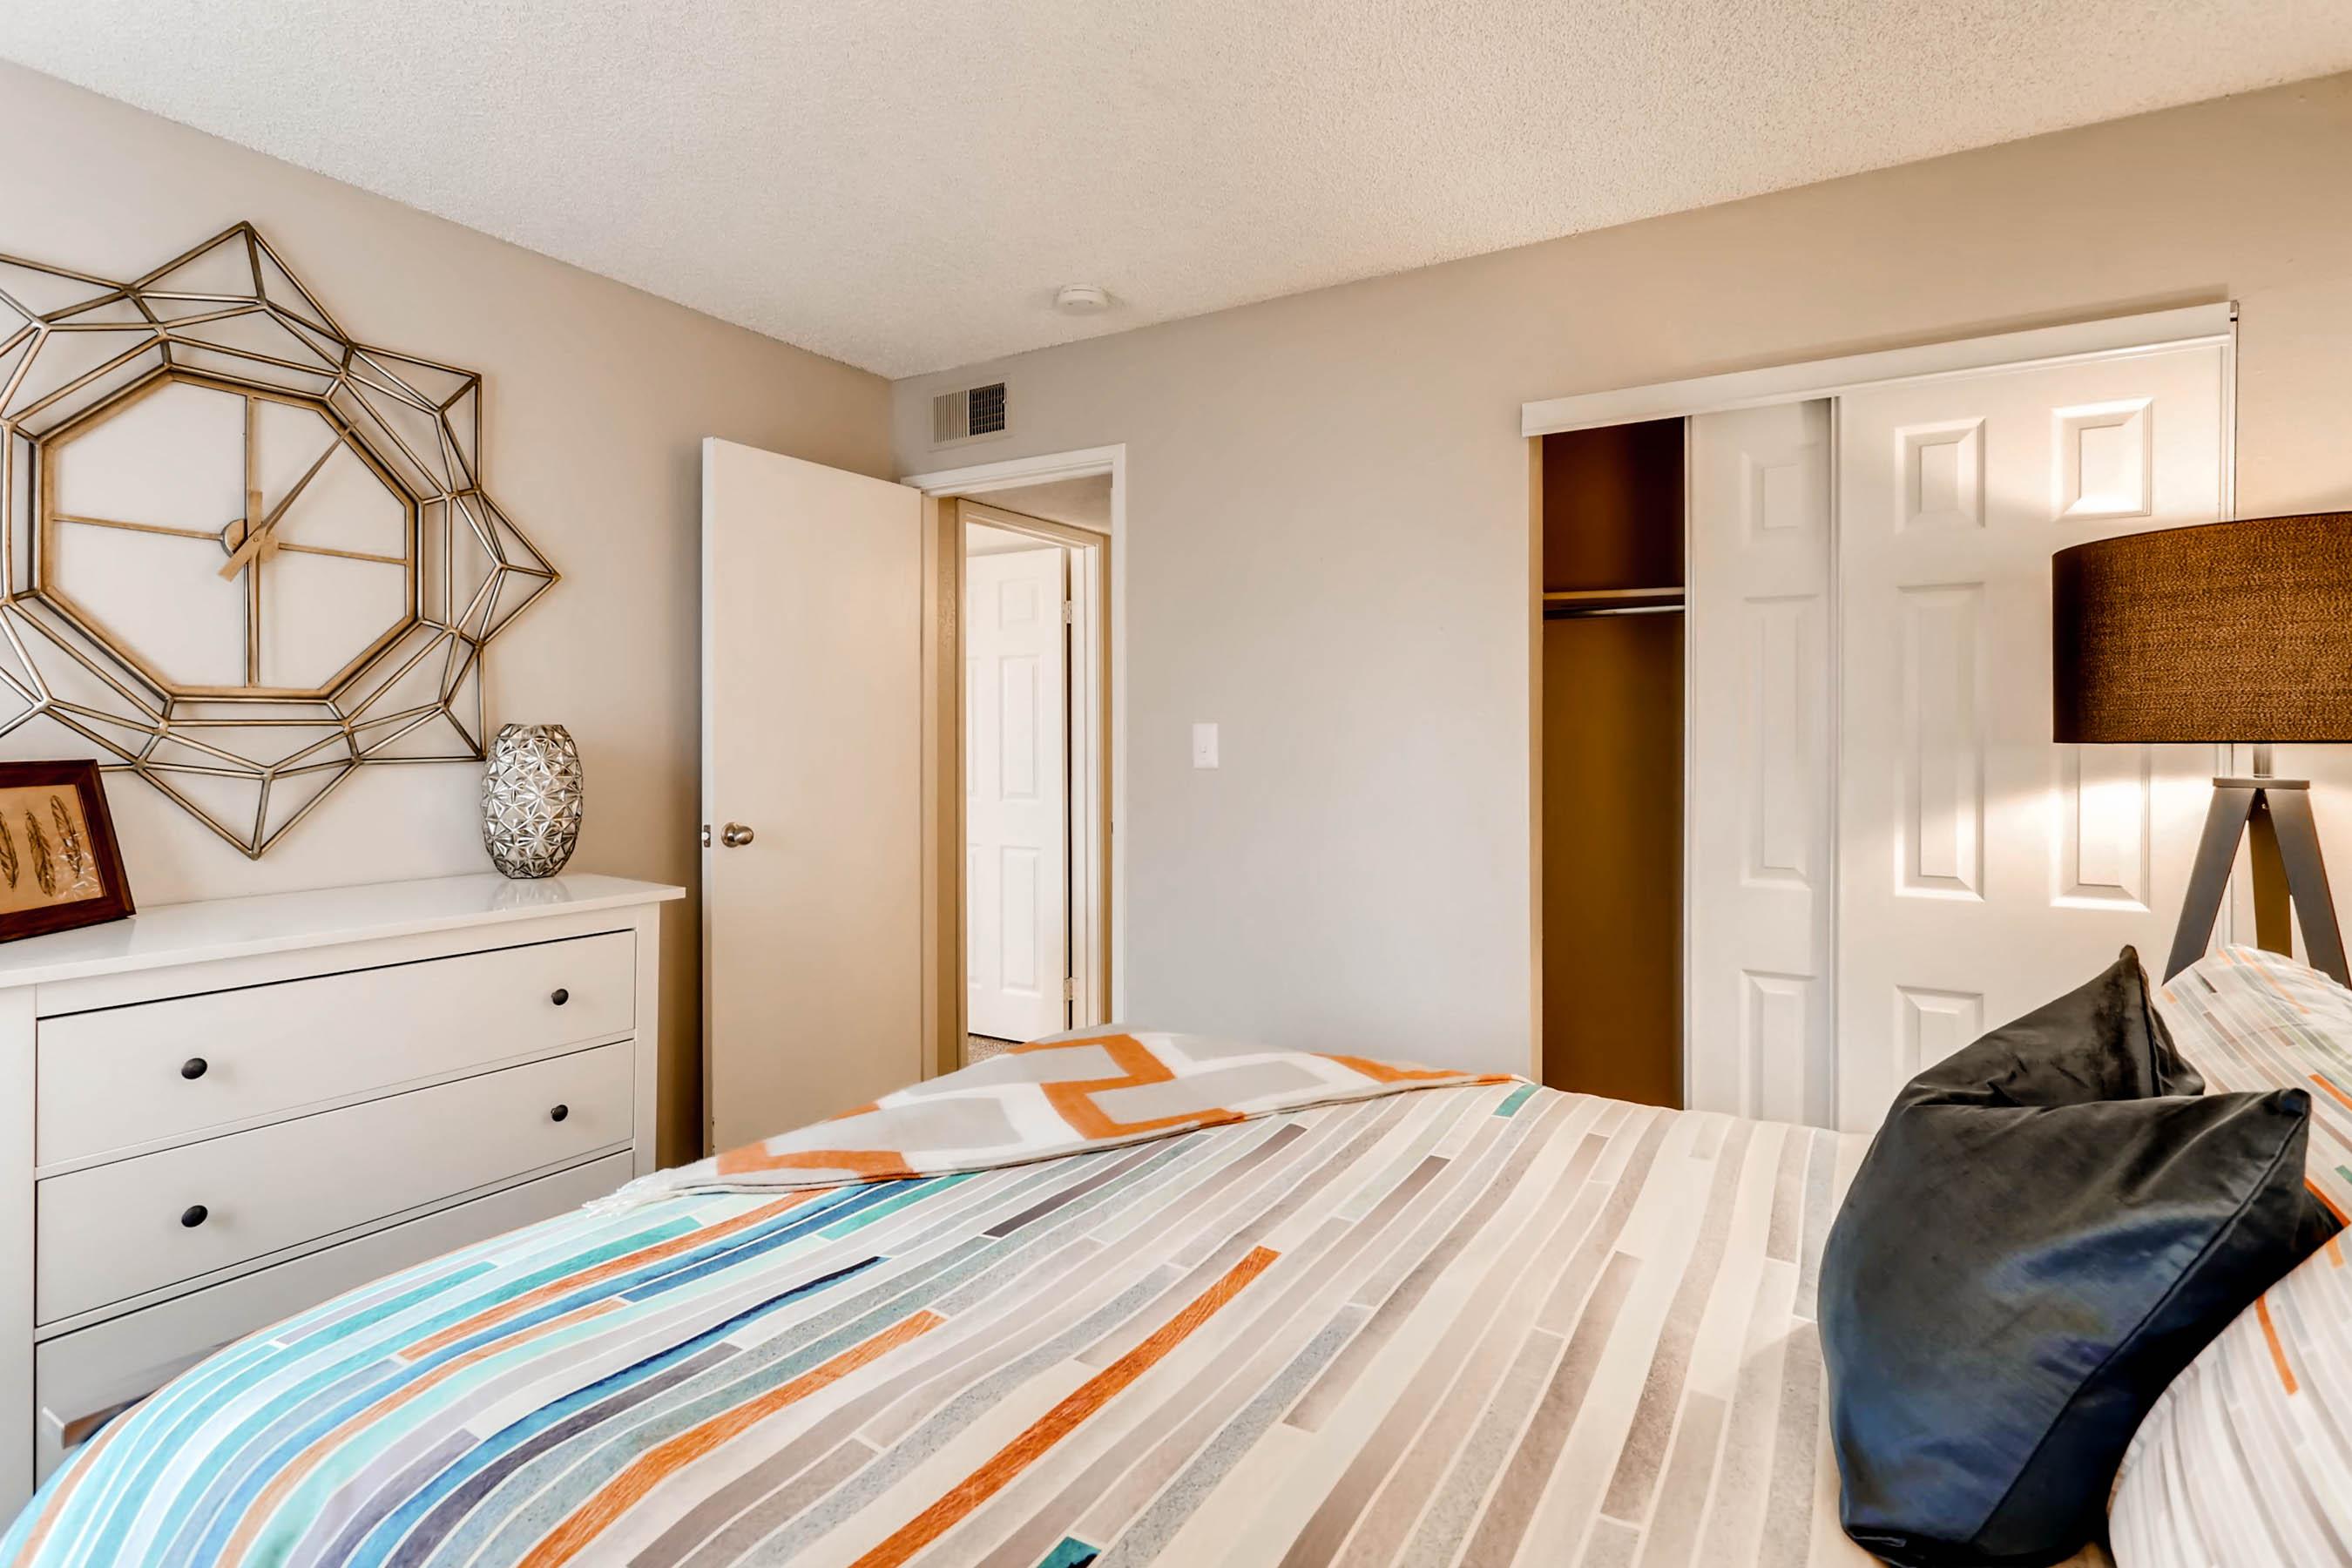 Highland Way Apartments image 4